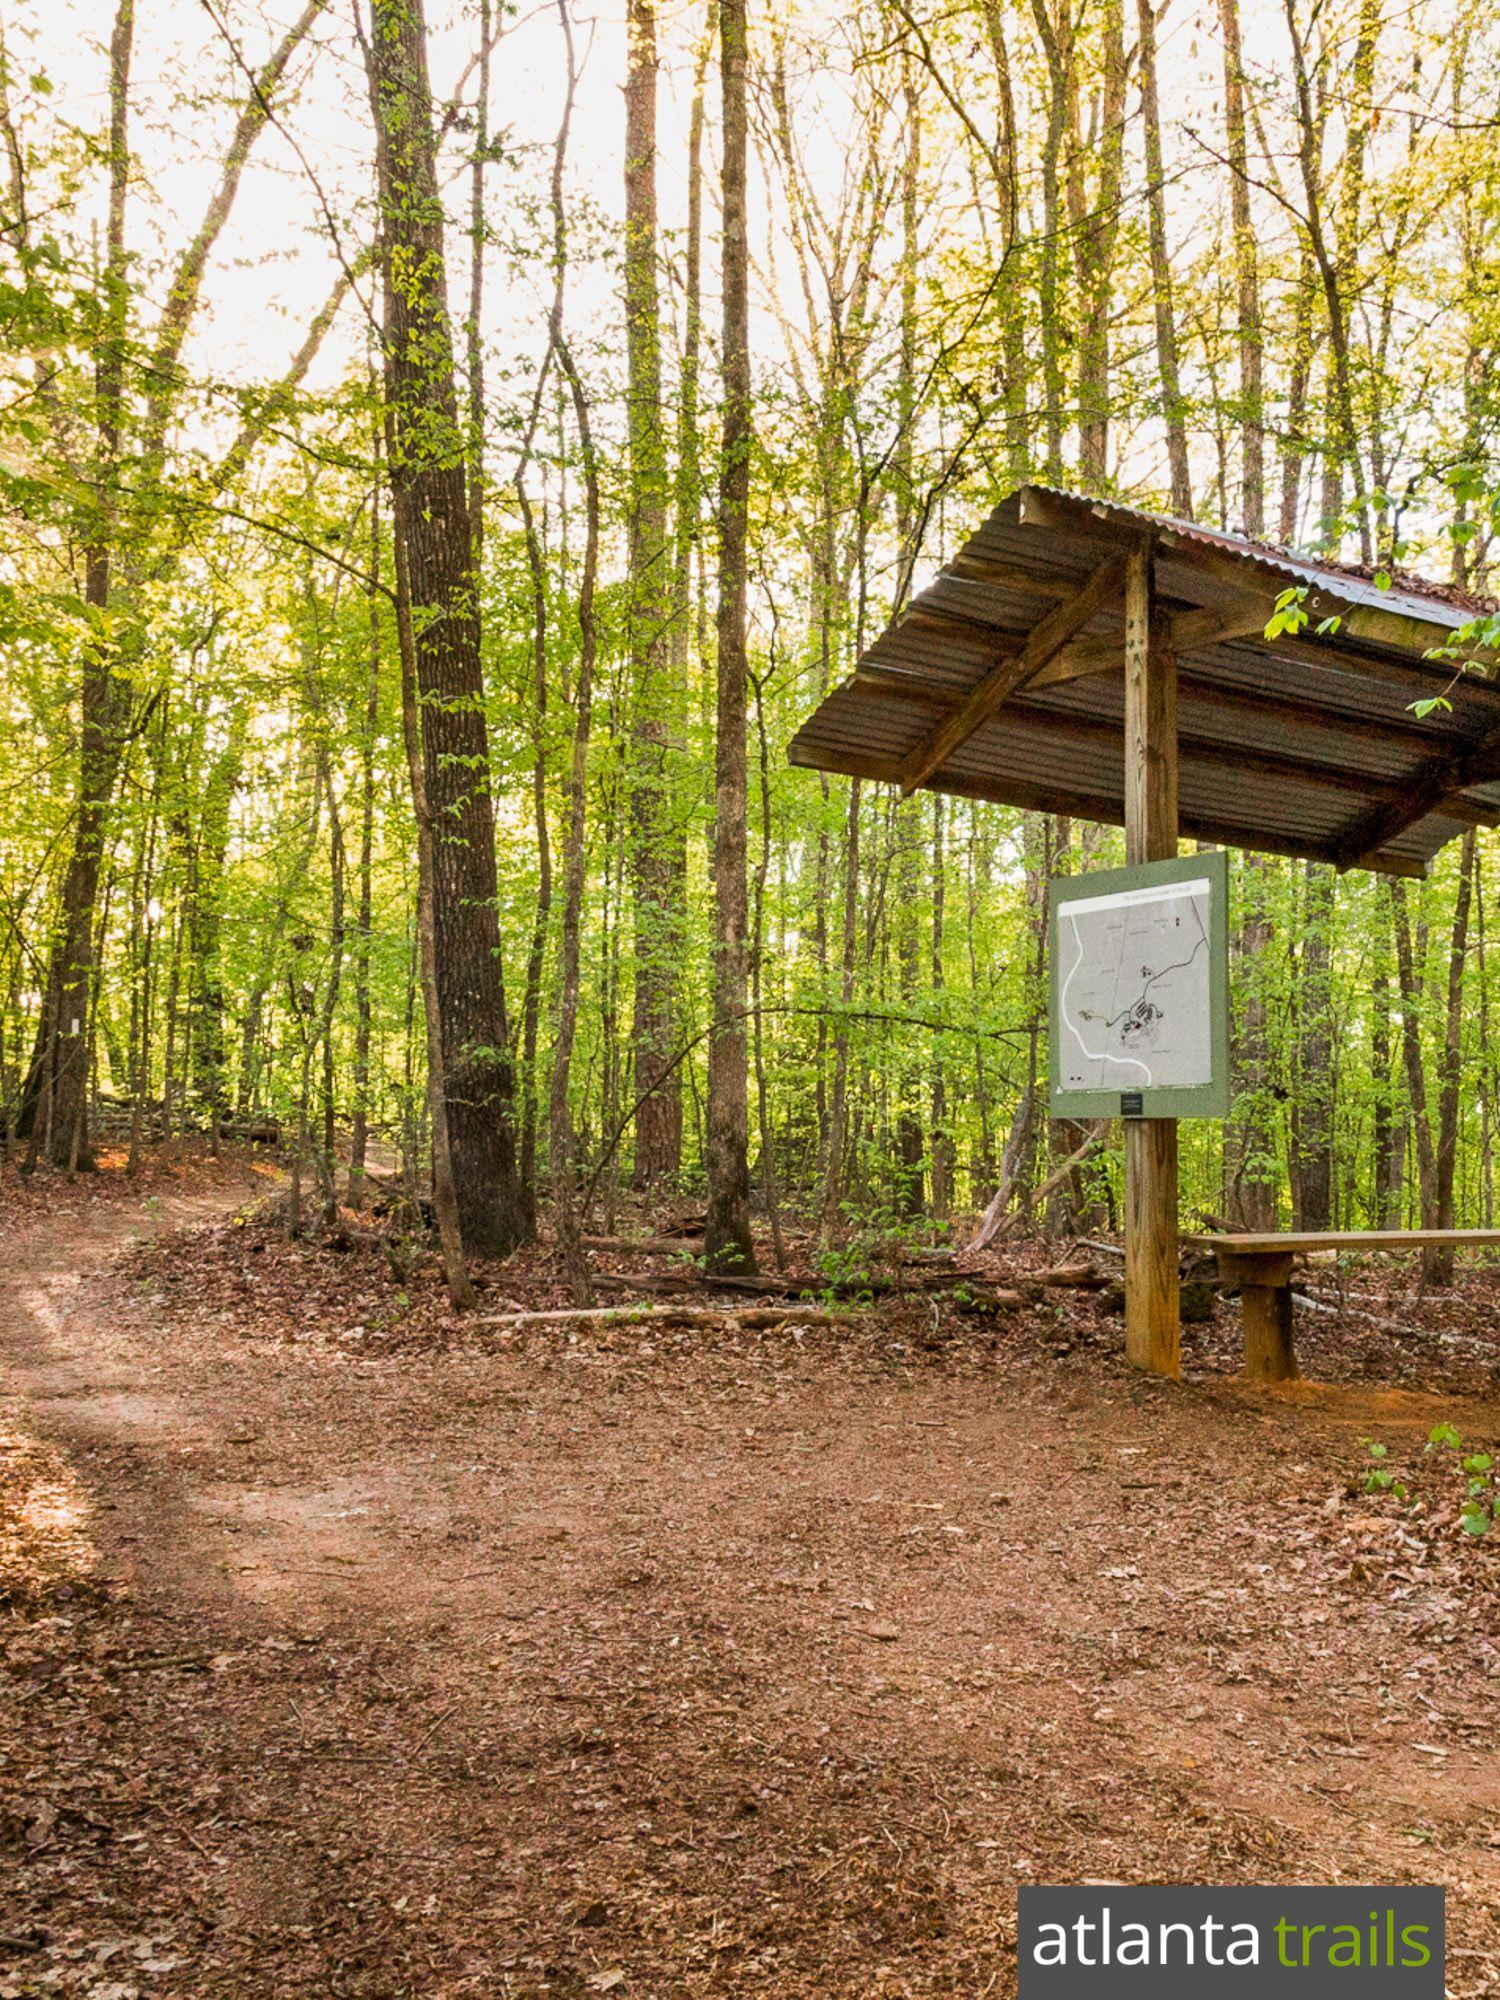 State Botanical Garden of Georgia: great Athens running trails ...